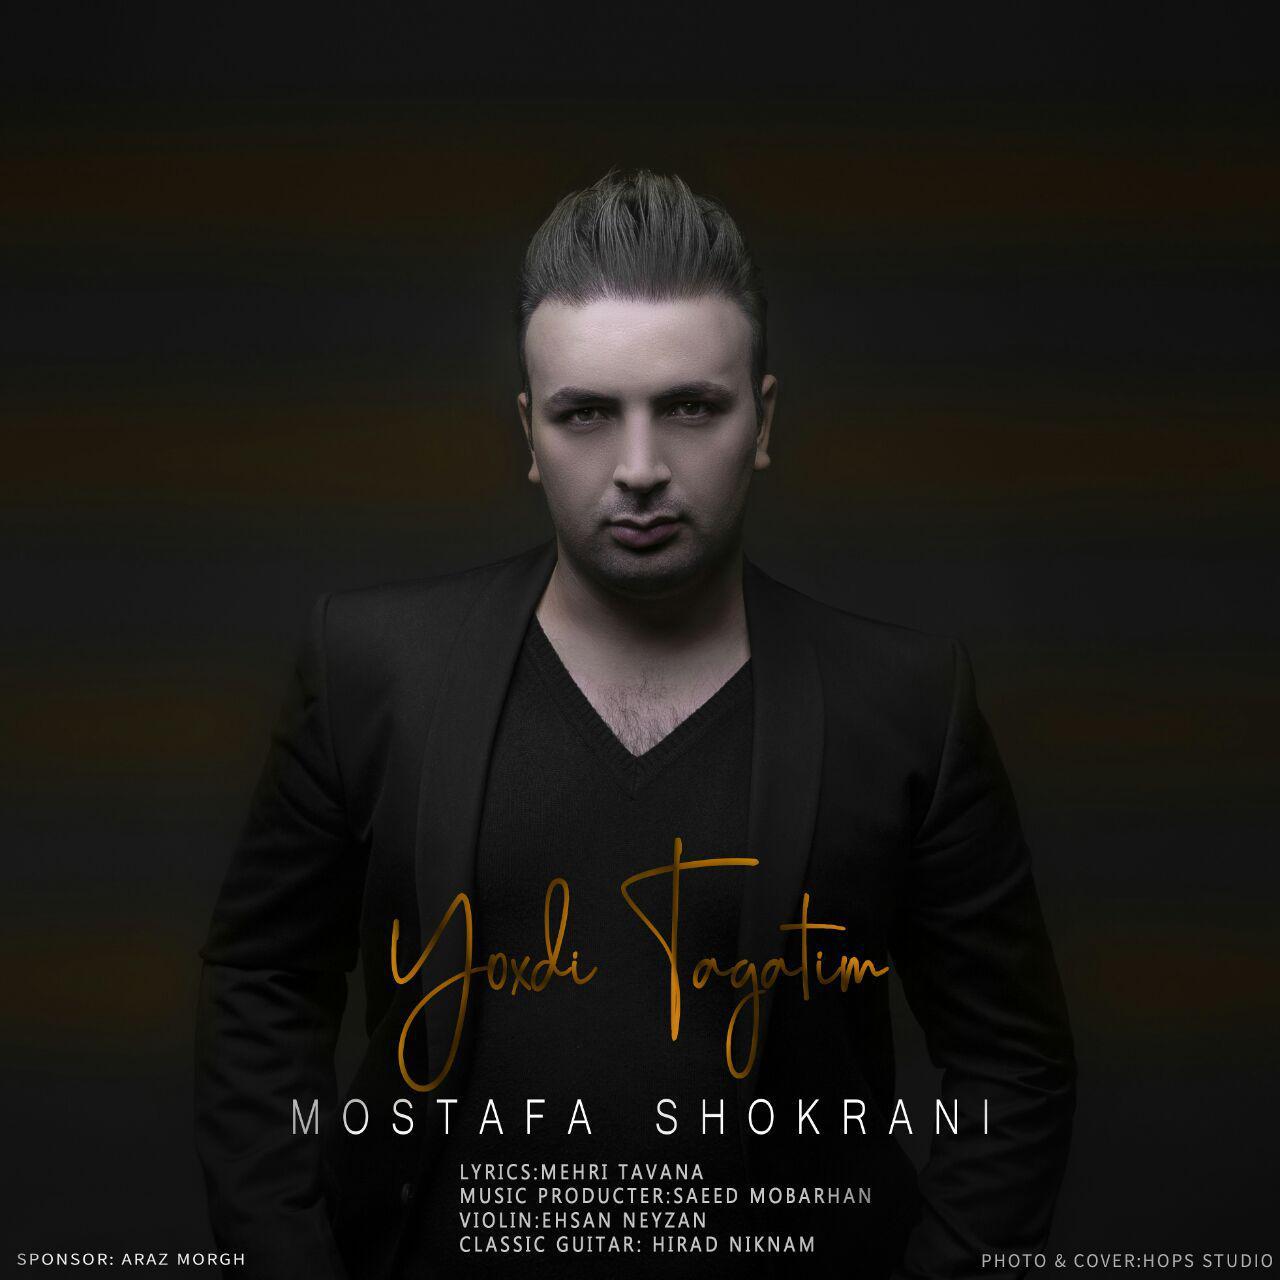 http://birtunes.ir/wp-content/uploads/2018/12/Mostafa-Shokrani-Yoxdi-Taqatim.jpg